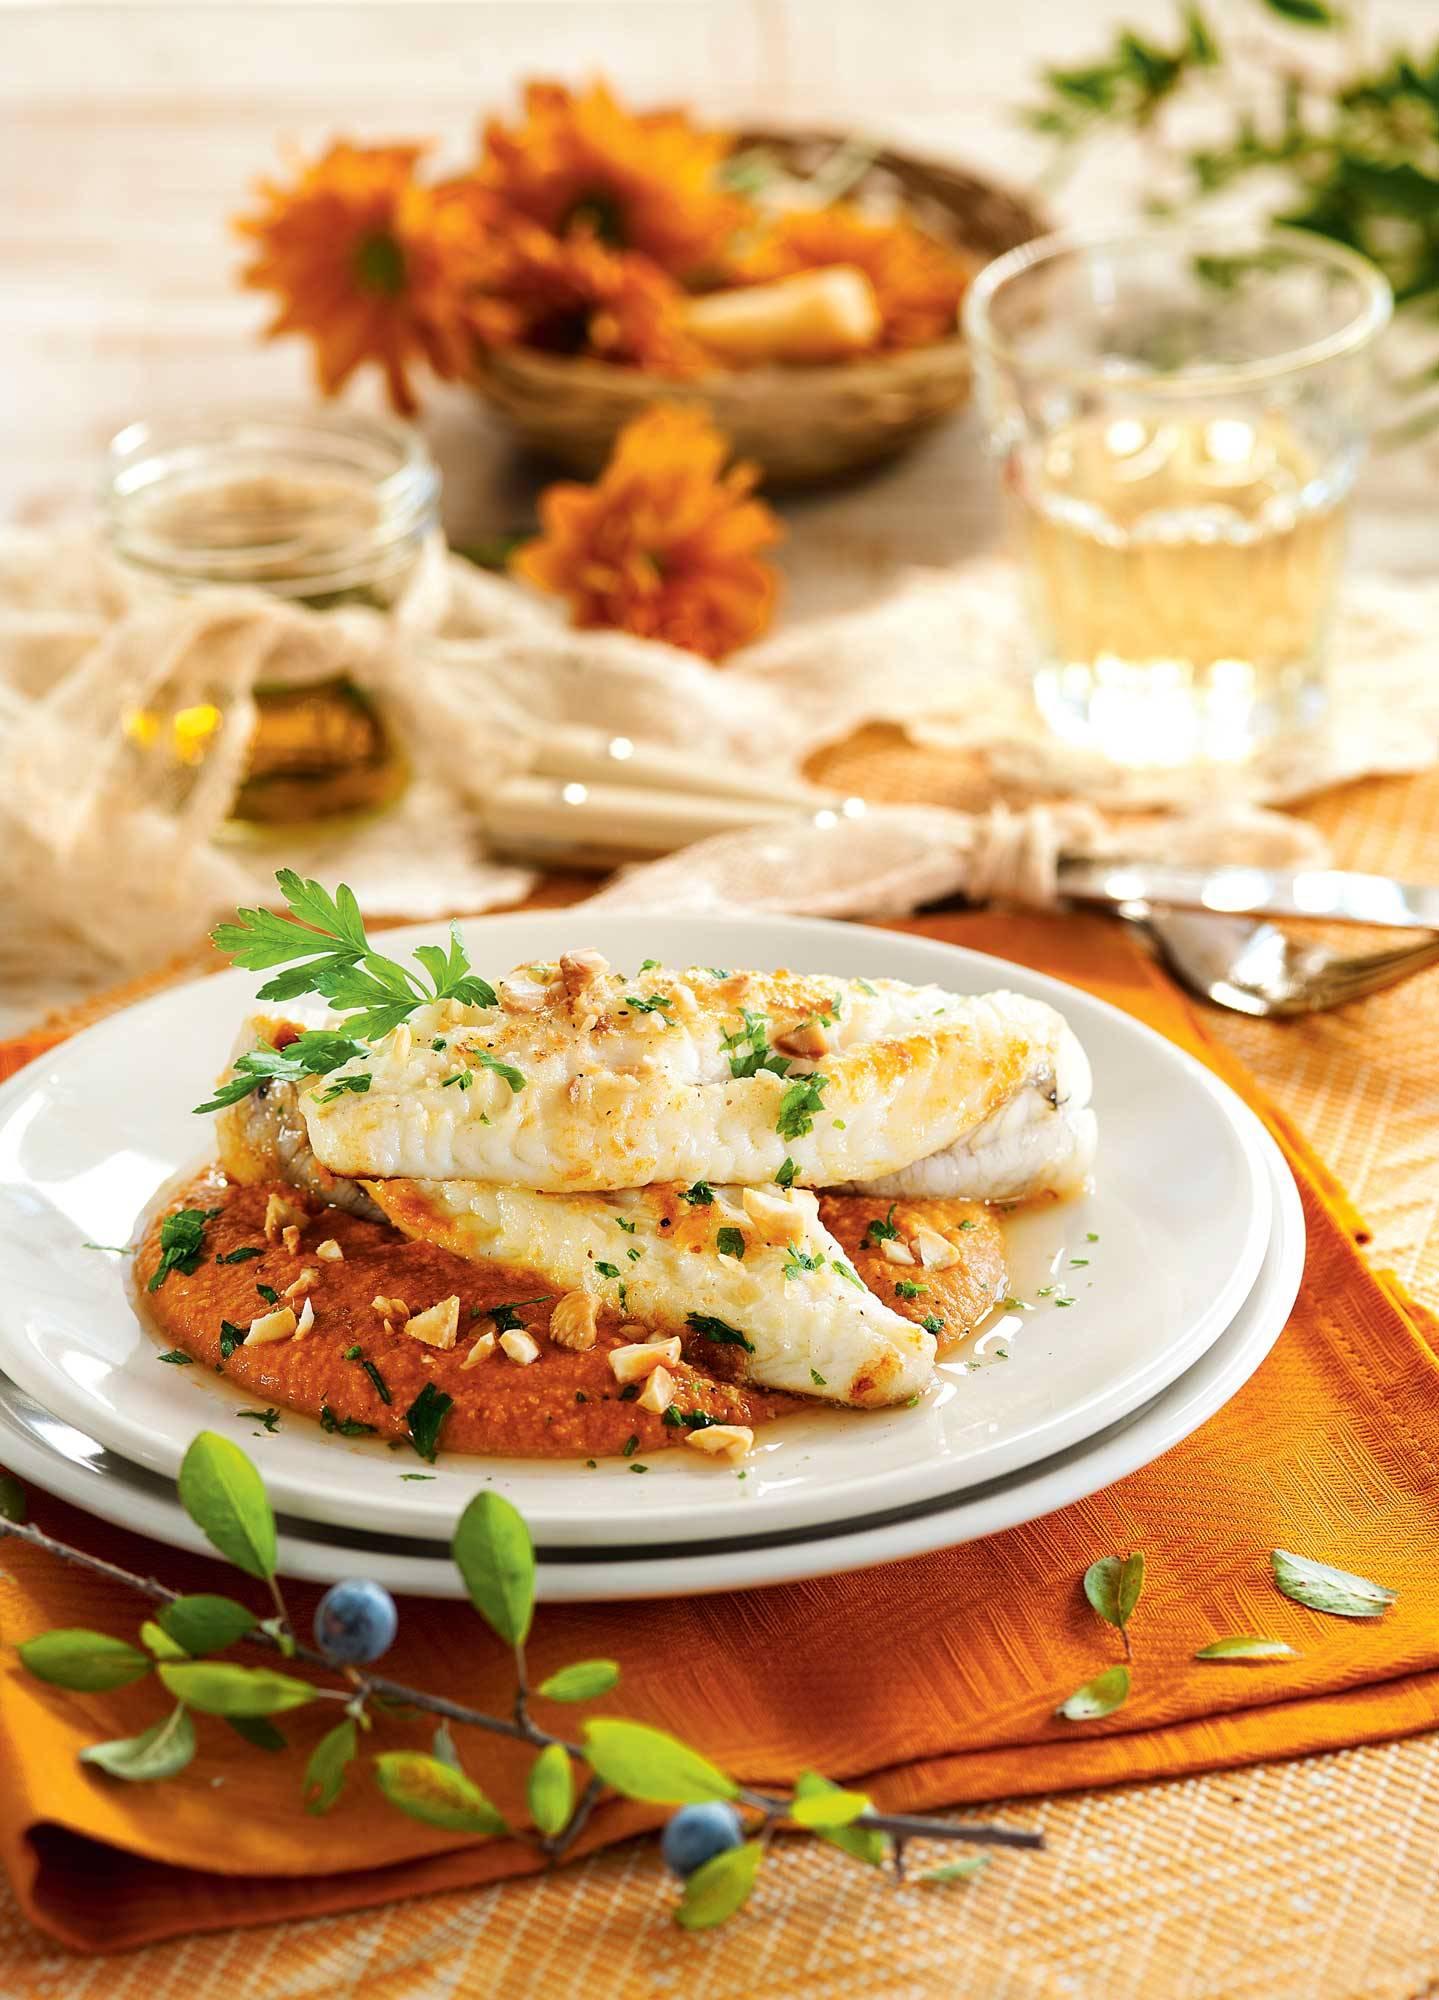 recipes-improve-health-monkfish 00391552